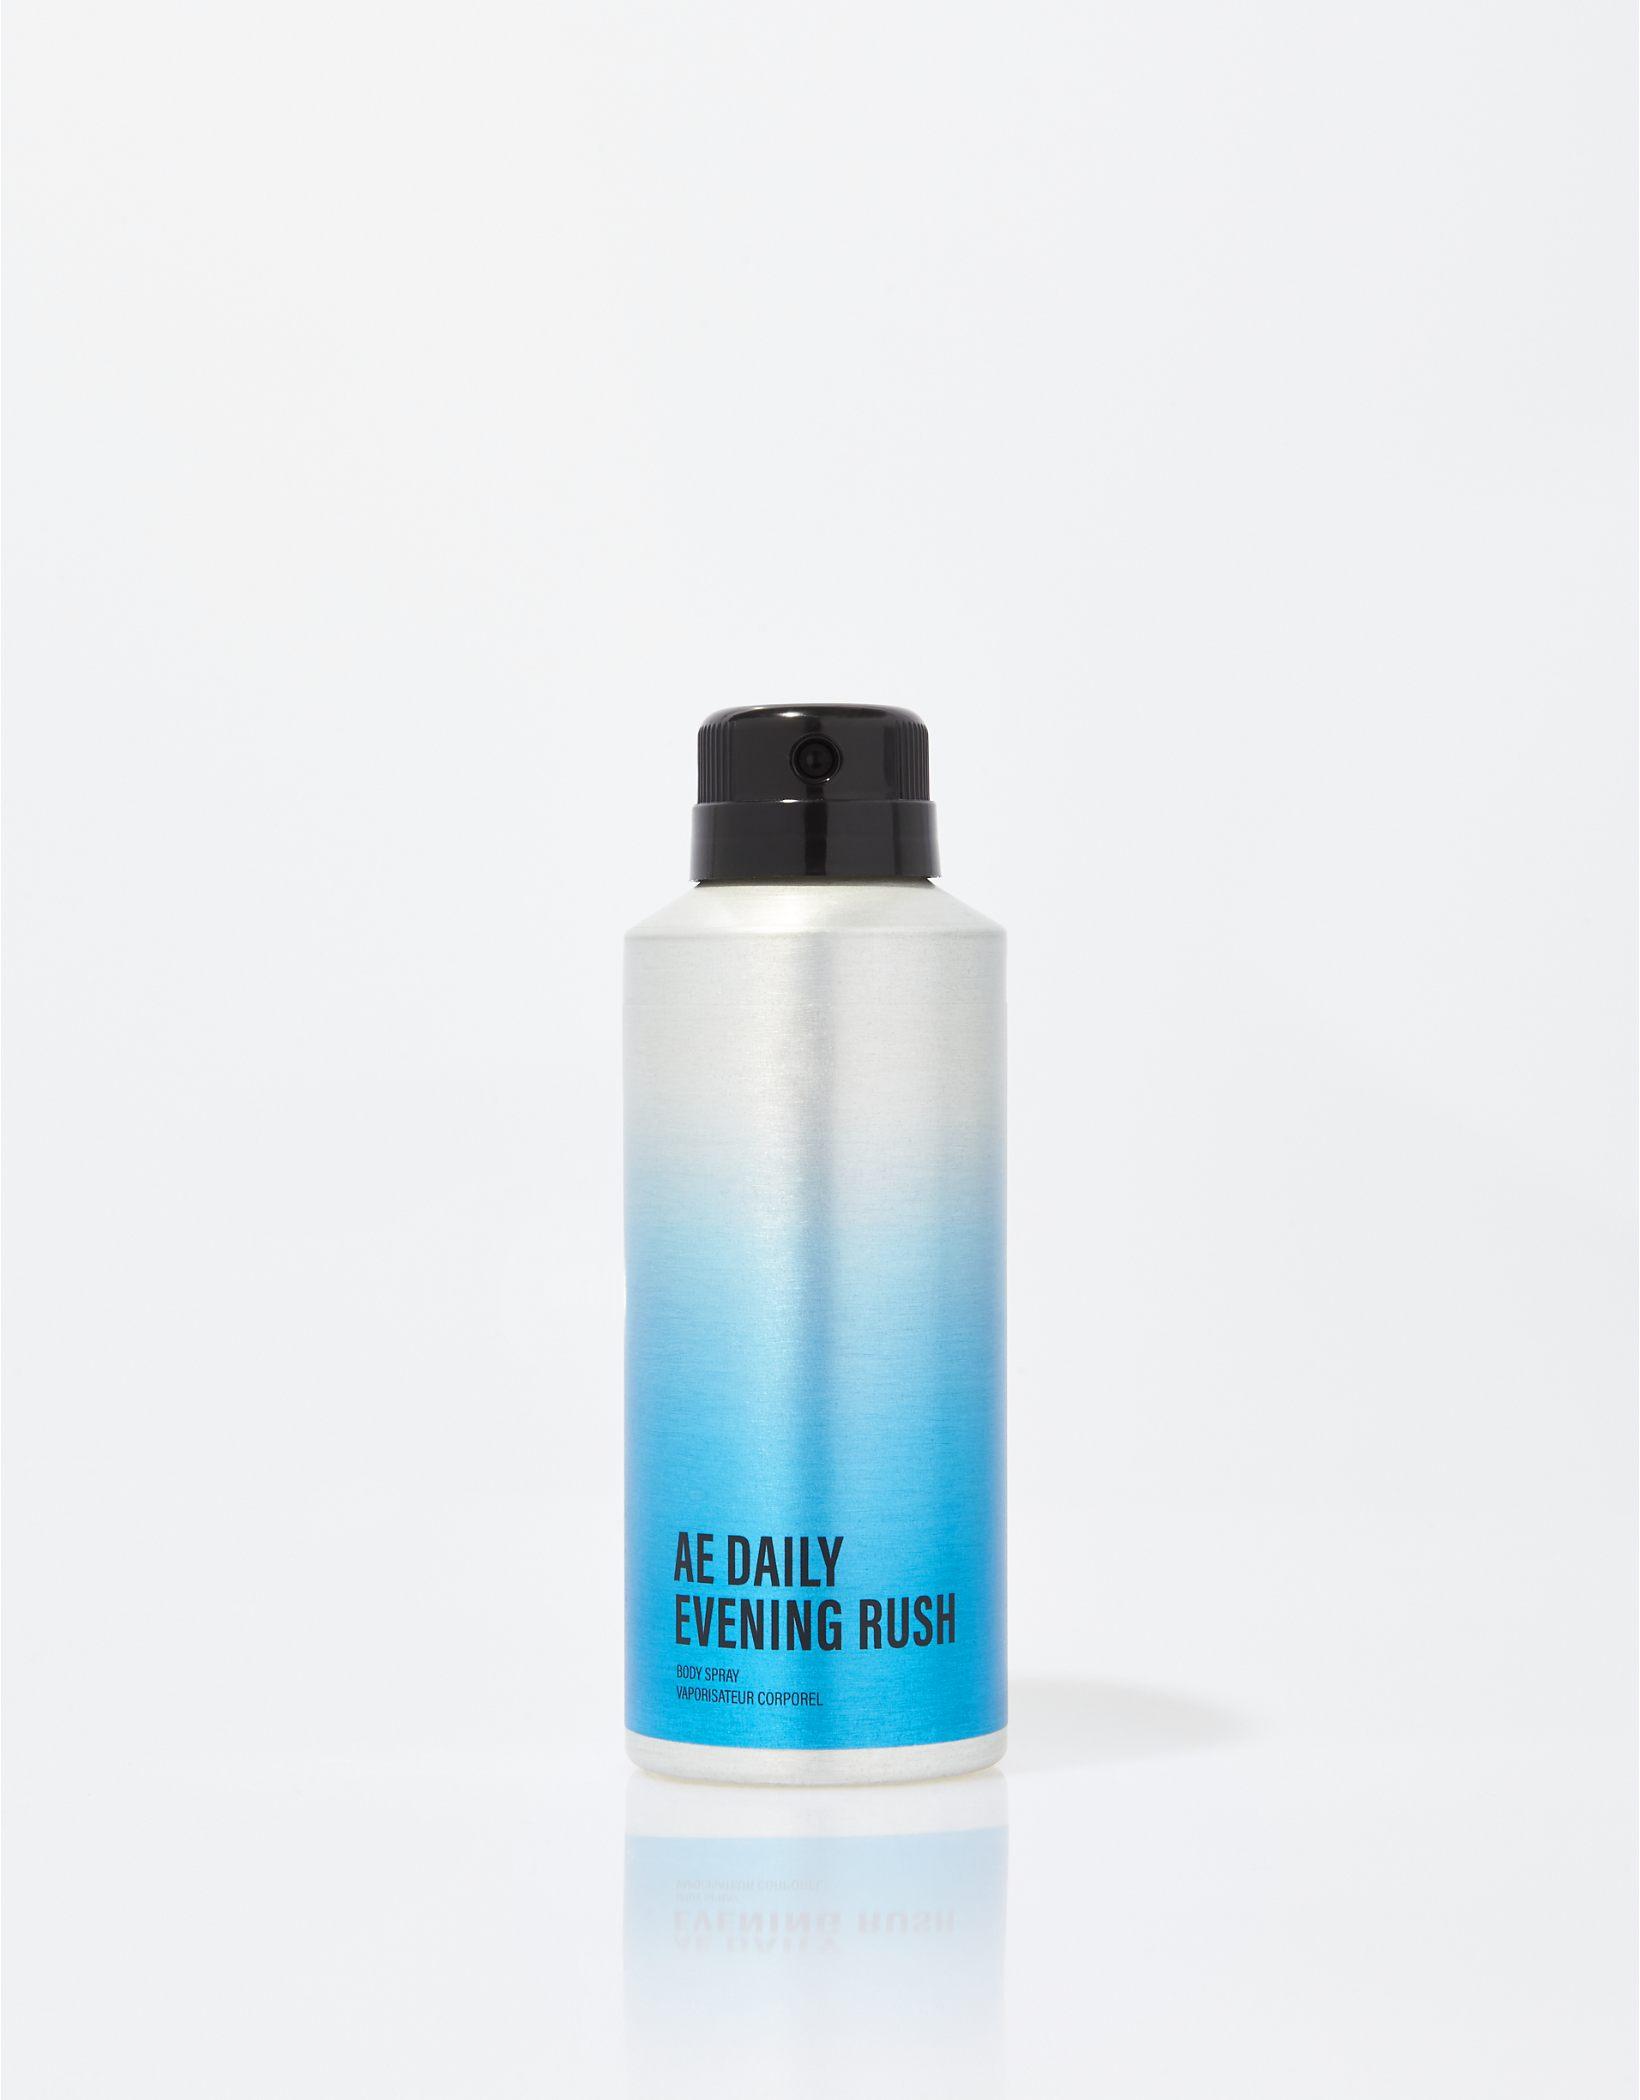 AEO Daily Evening Rush 4.5oz Body Spray